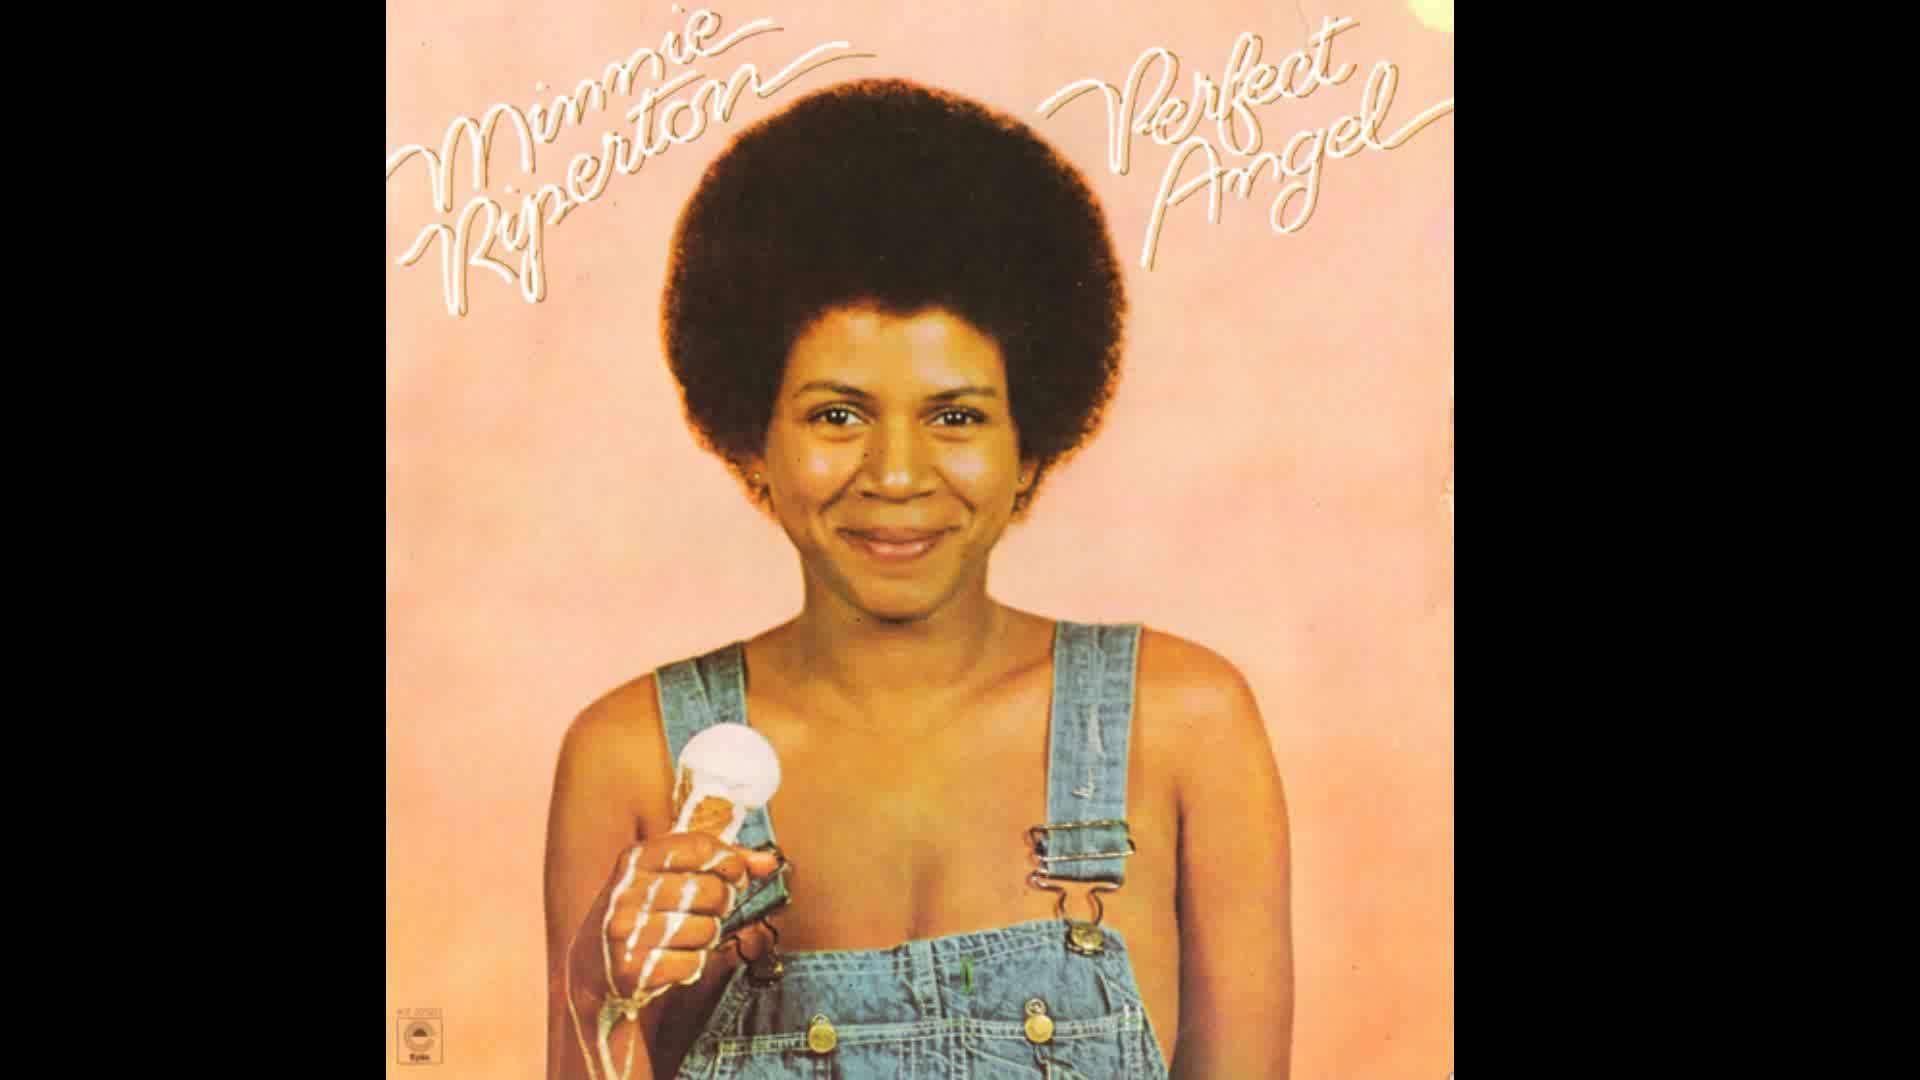 Minnie Riperton - Lovin' You (Official Audio) (HQ) - YouTube